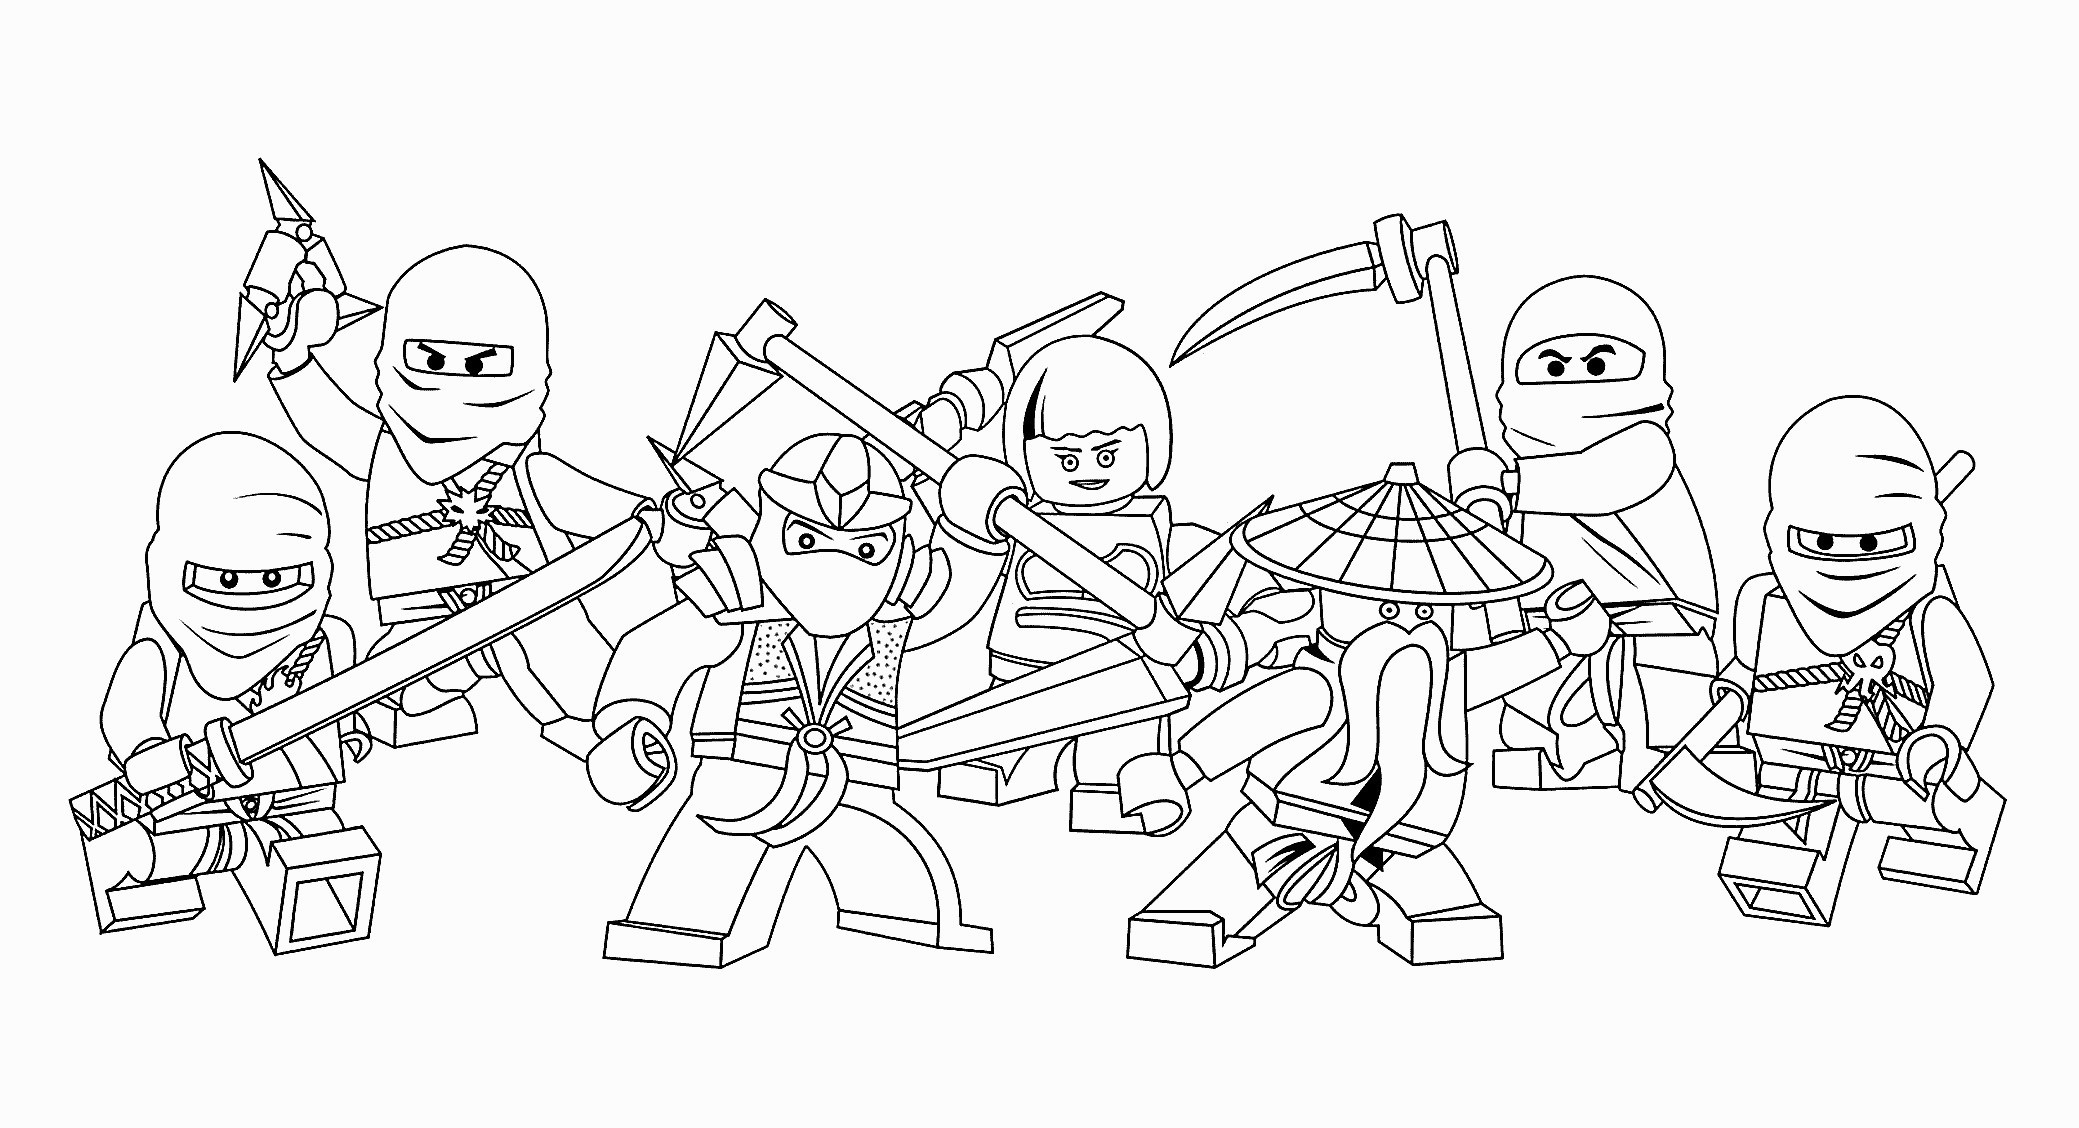 Lego Ninjago Malvorlagen Neu Ninjago Ausmalbilder Zum Ausdrucken Neueste Modelle Lego Ninjago Sammlung